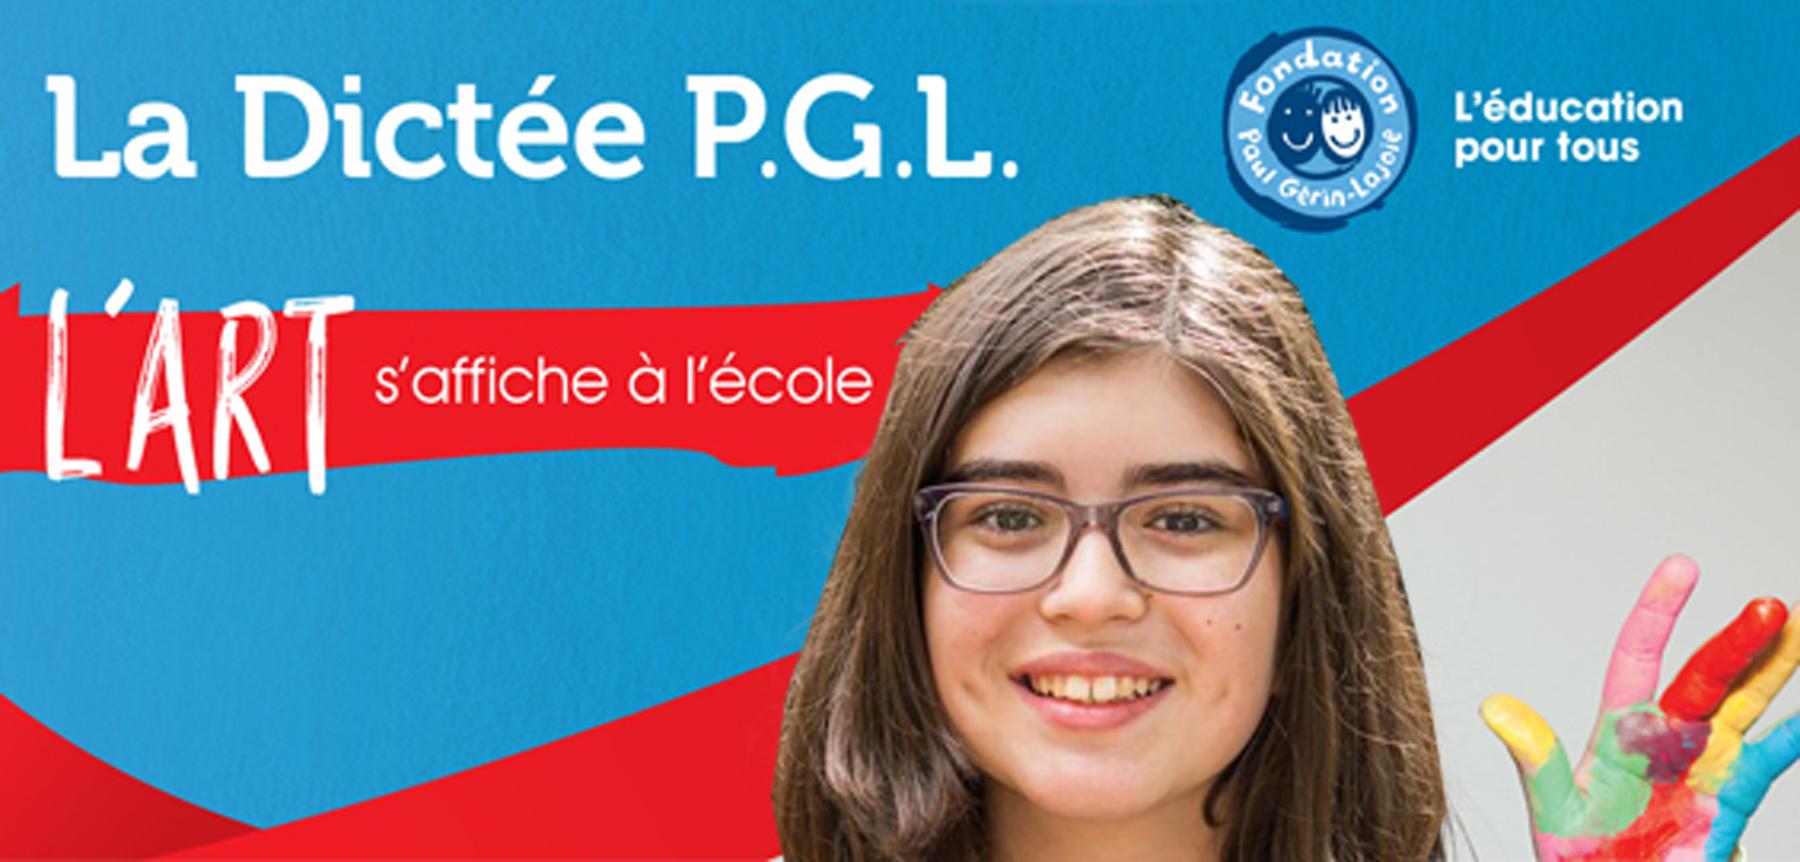 PGL web.jpg